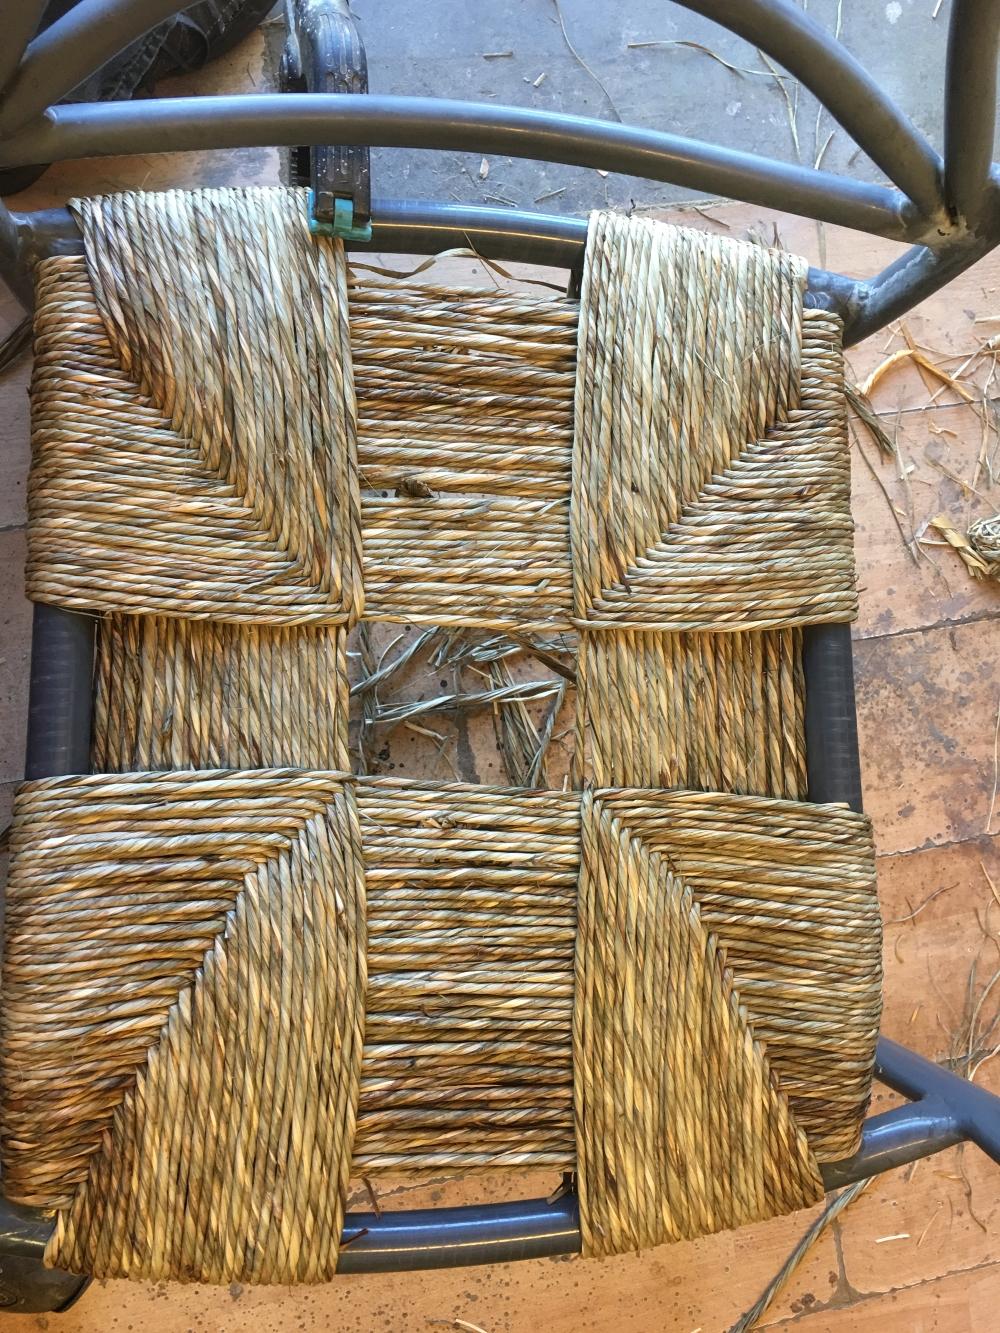 rempaillage chaise paillage chaise nimes gard. Black Bedroom Furniture Sets. Home Design Ideas